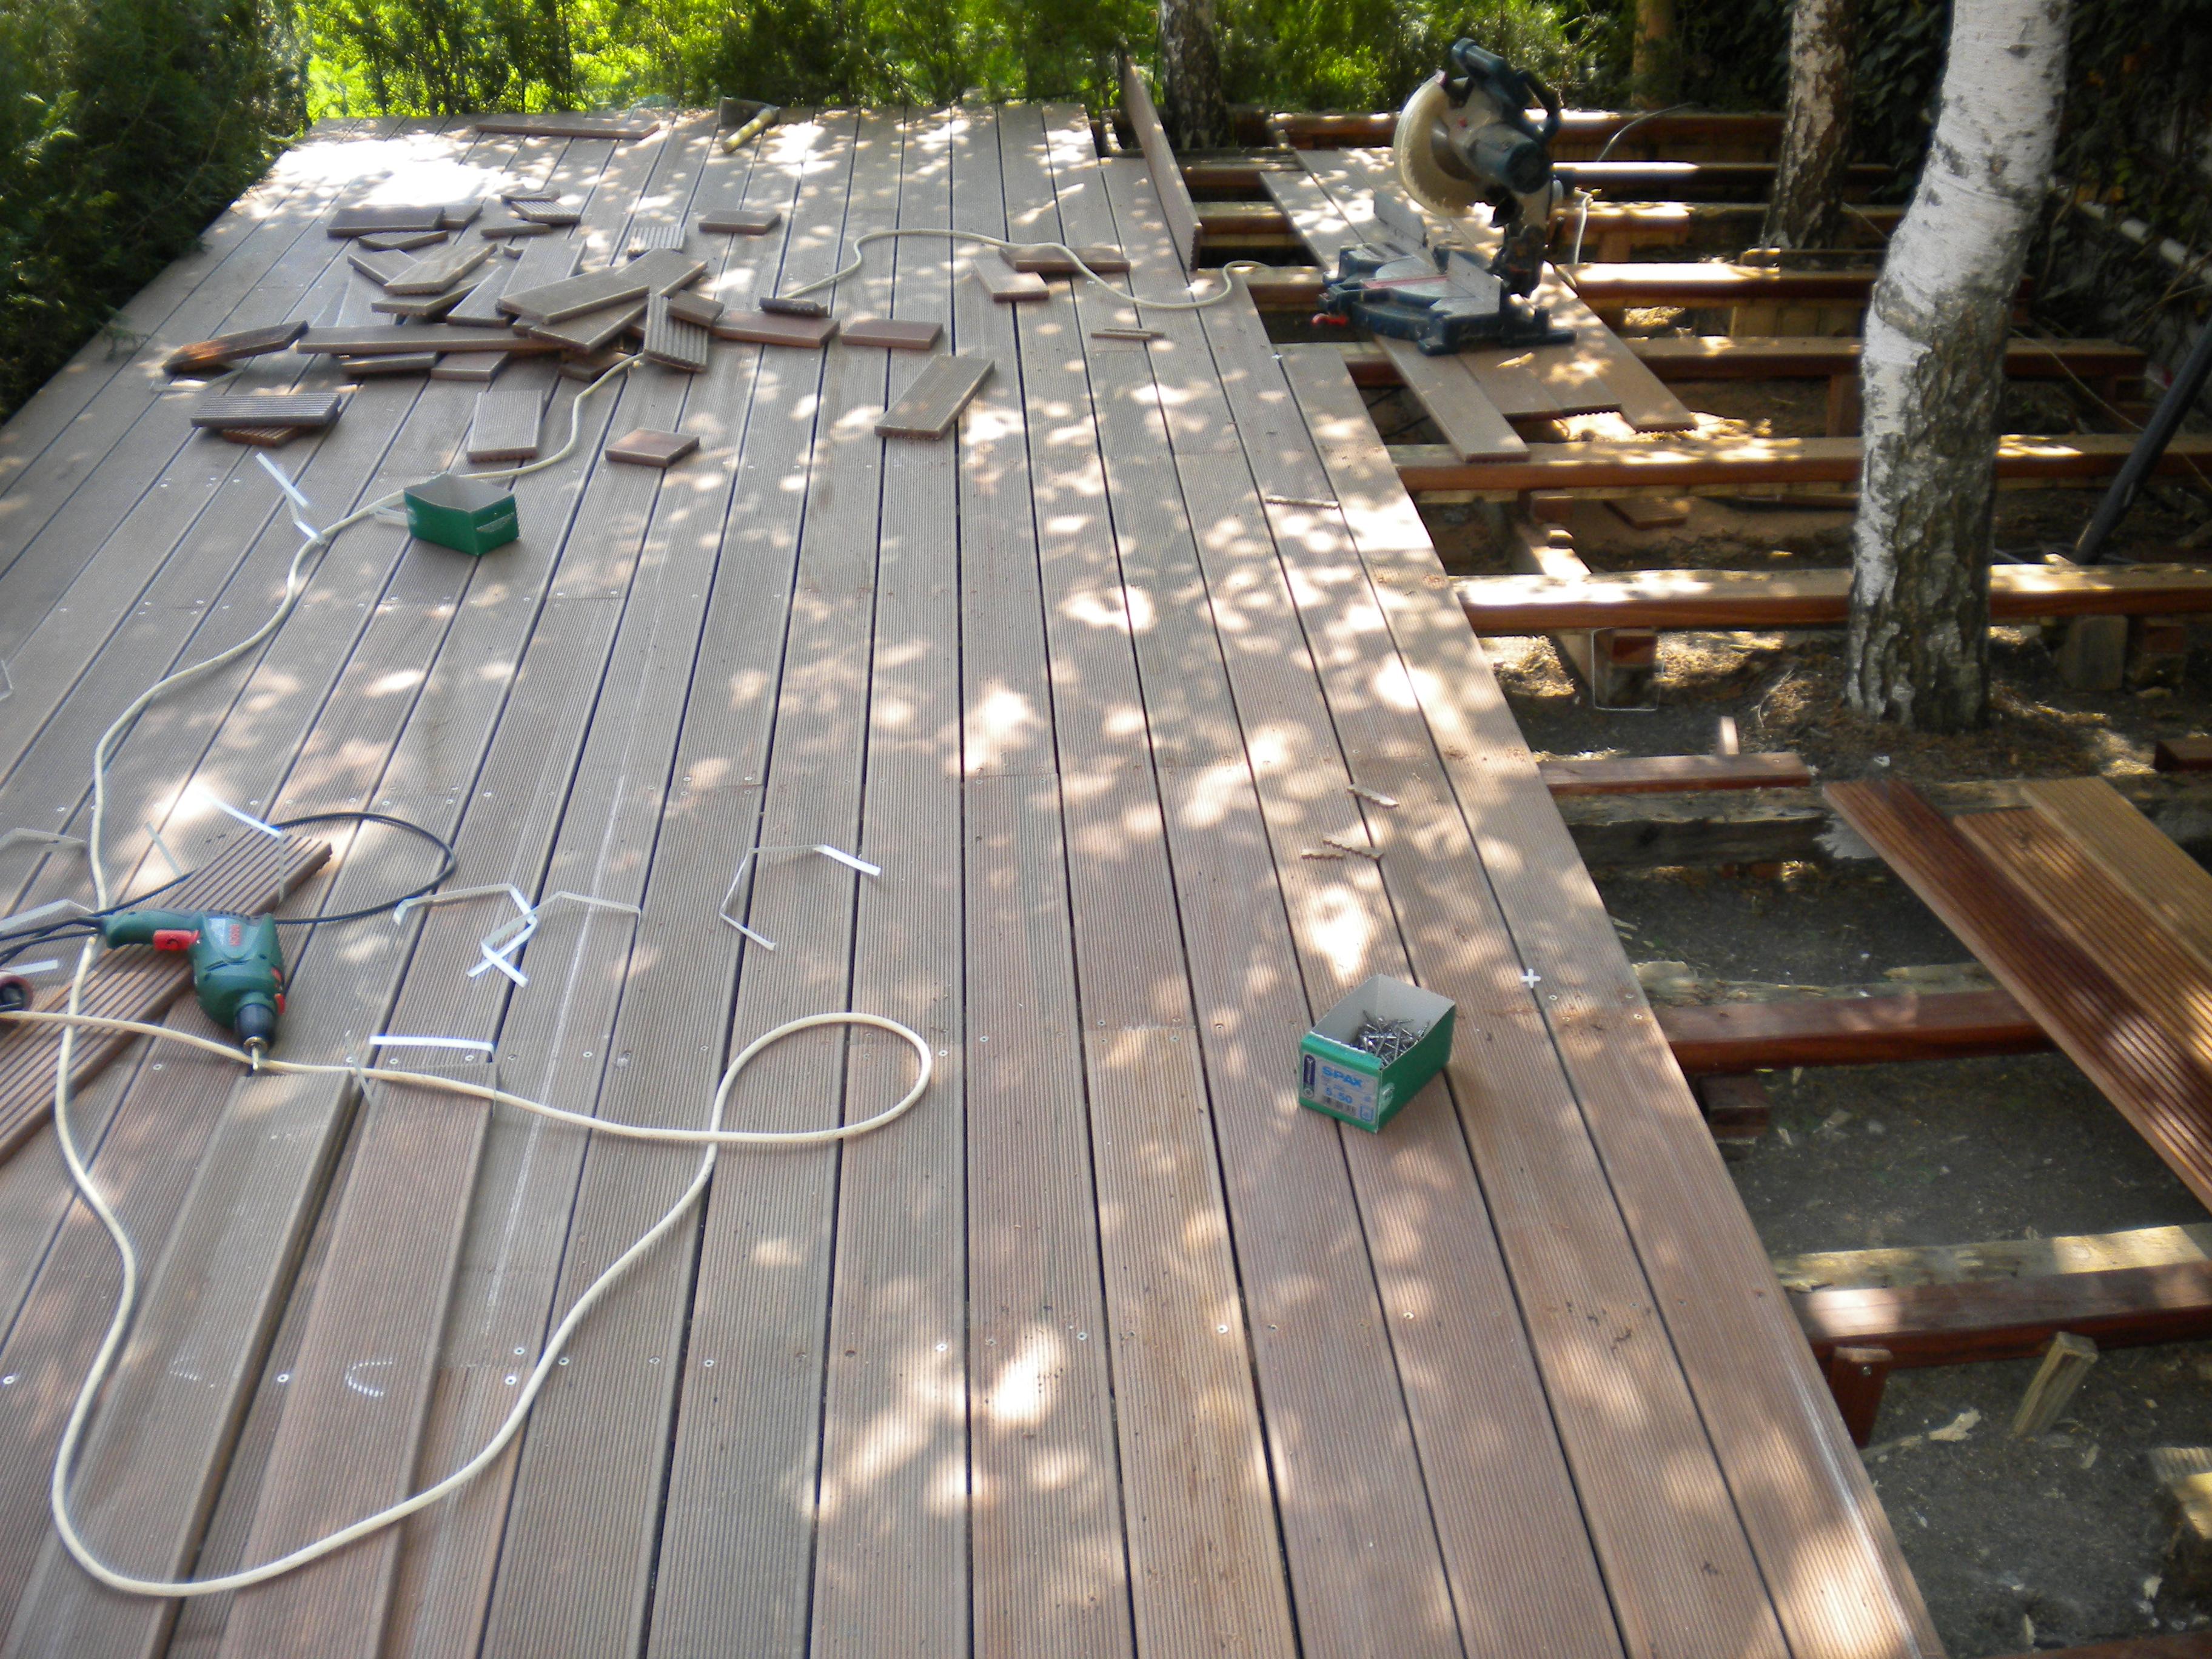 Deck-uri lemn - Uxi SELVA FLOORS - Poza 9